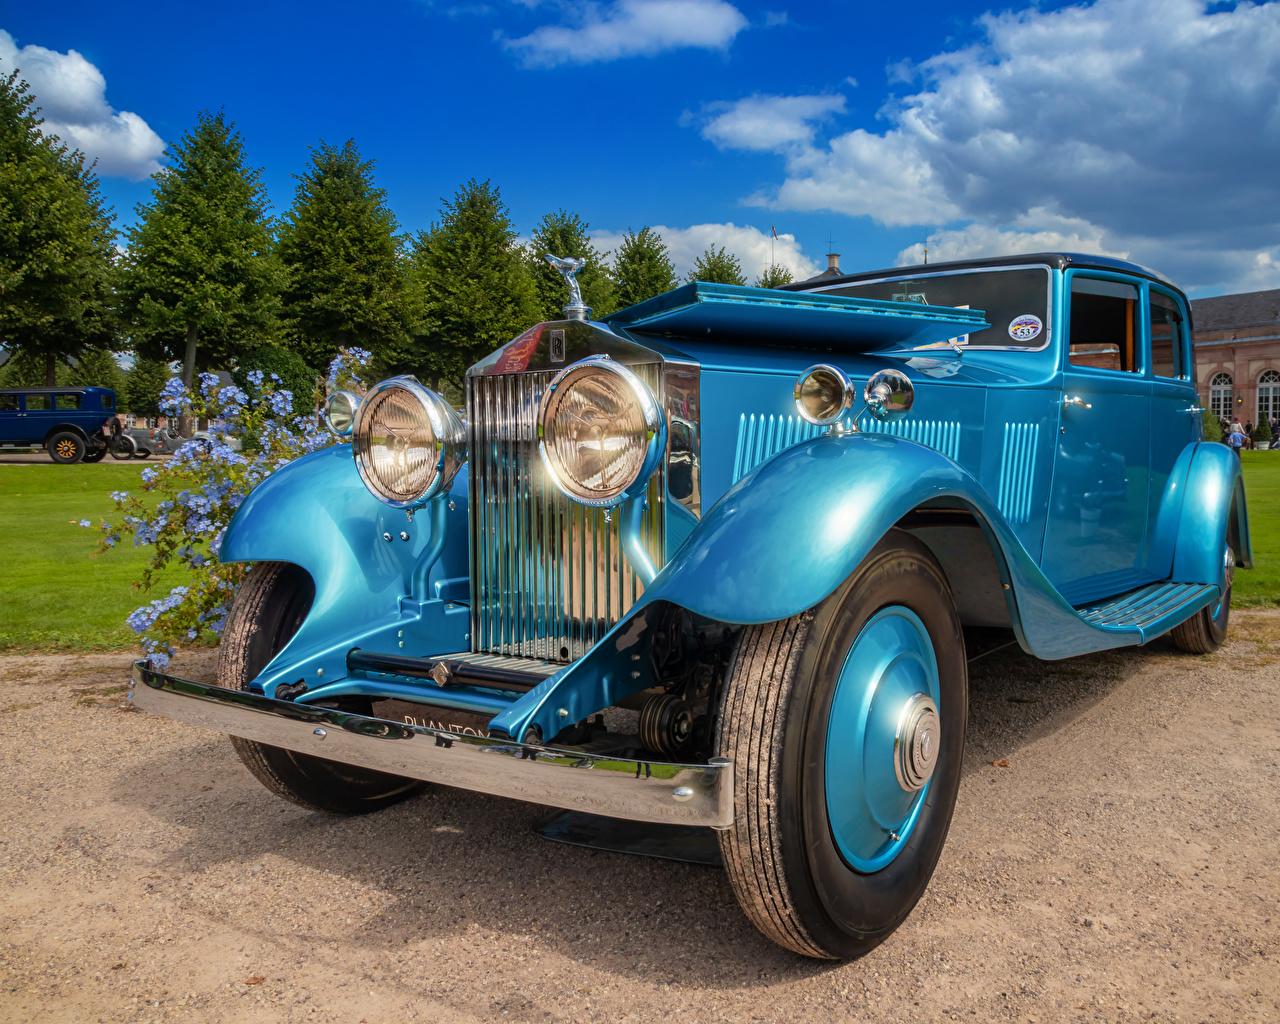 Images Rolls-Royce 1933 Phantom II Continental Retro Light Blue automobile vintage antique Cars auto